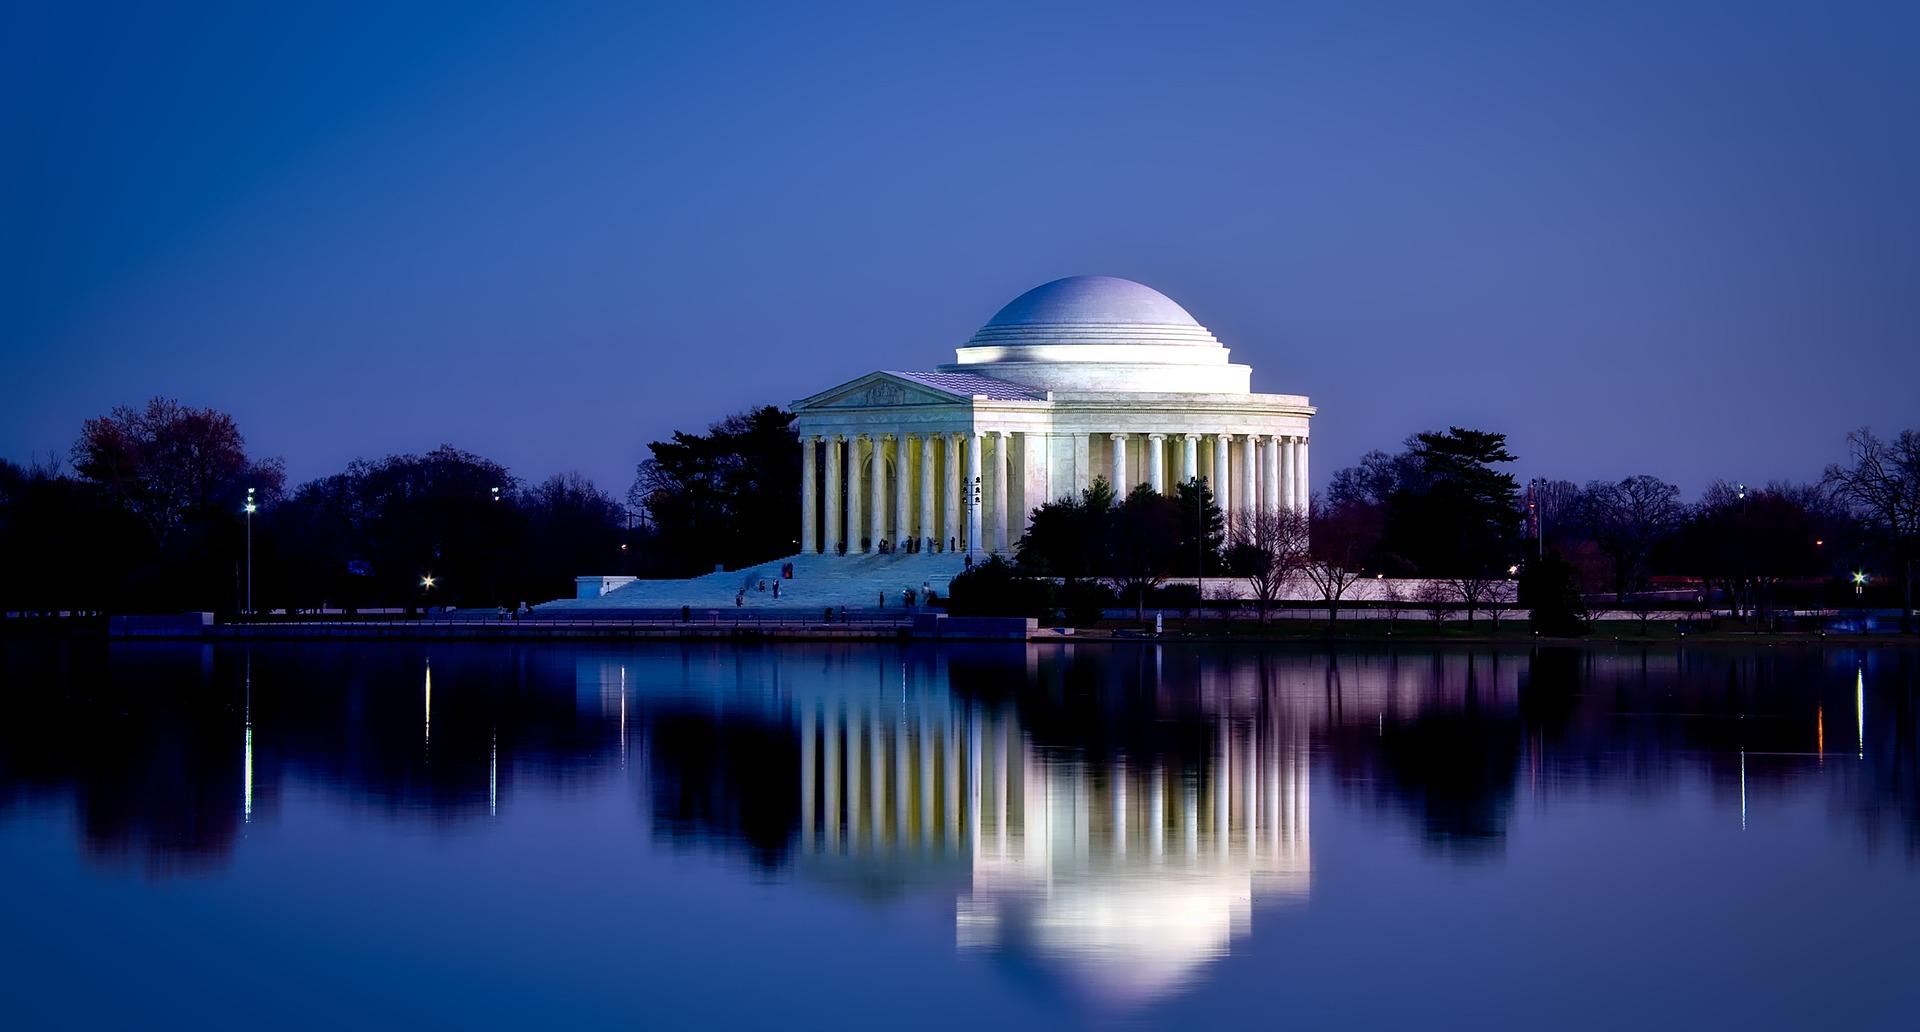 Thomas Jefferson Memorial, Washington, DC